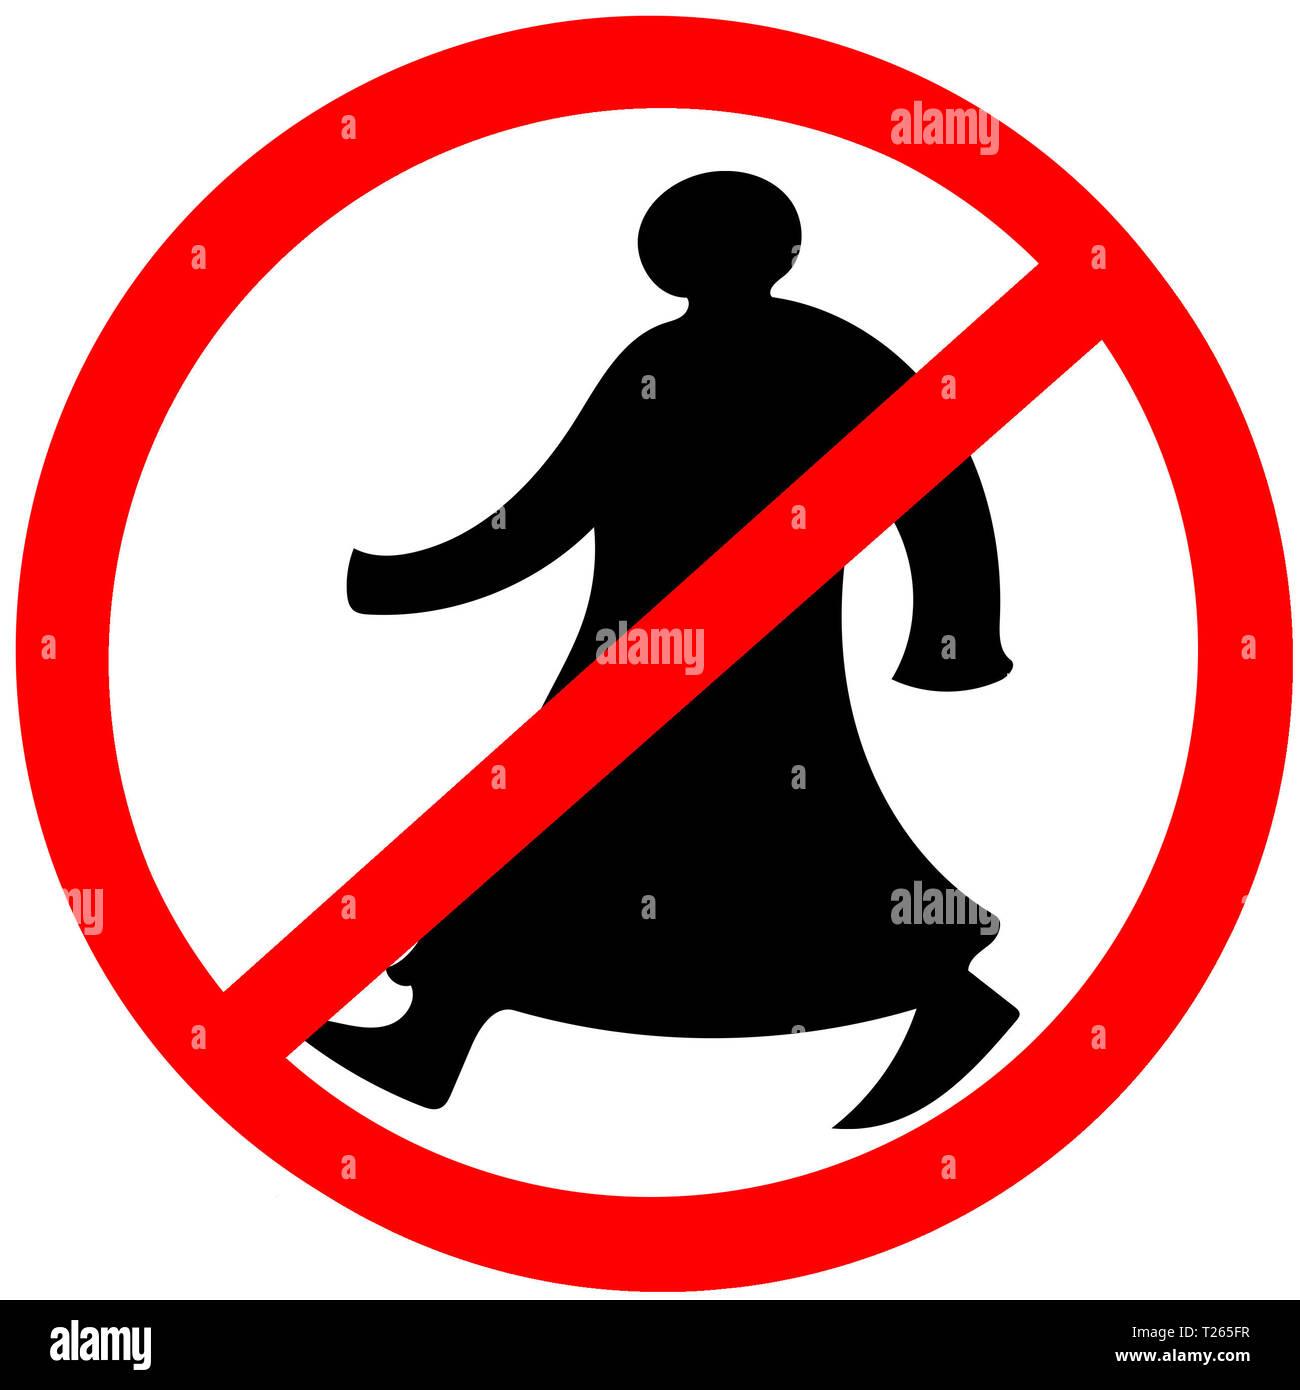 Walking arab circular prohibition road sign warning caution isolated. - Stock Image